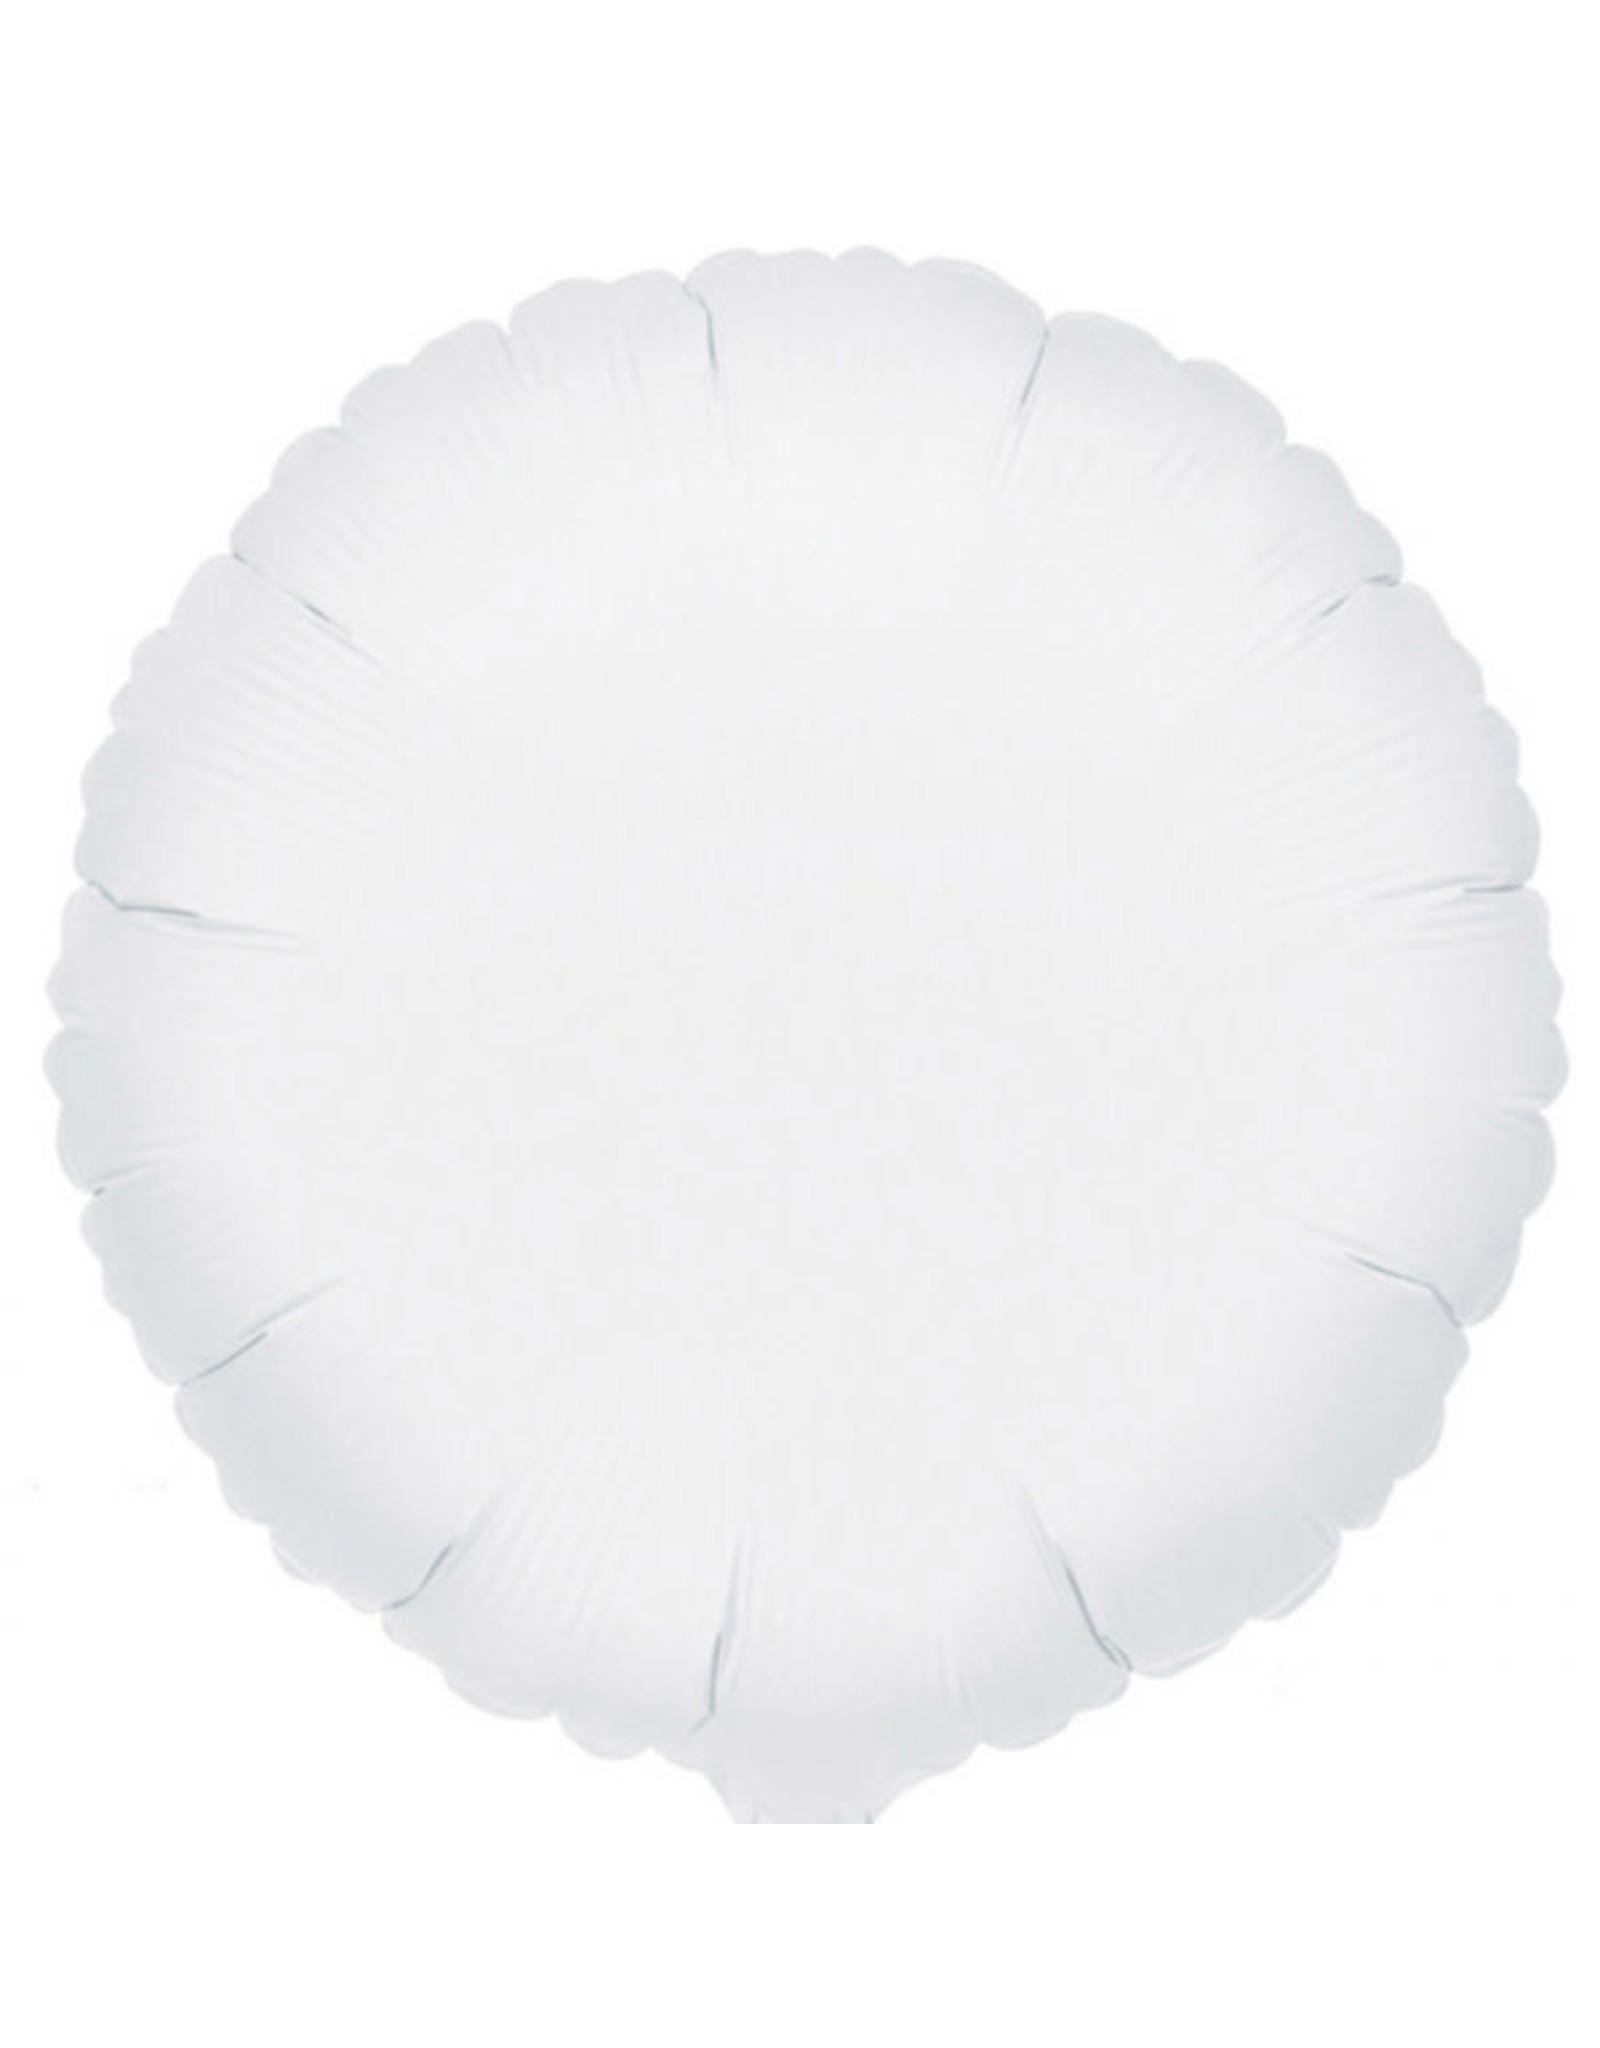 Amscan folieballon wit rond 43 cm